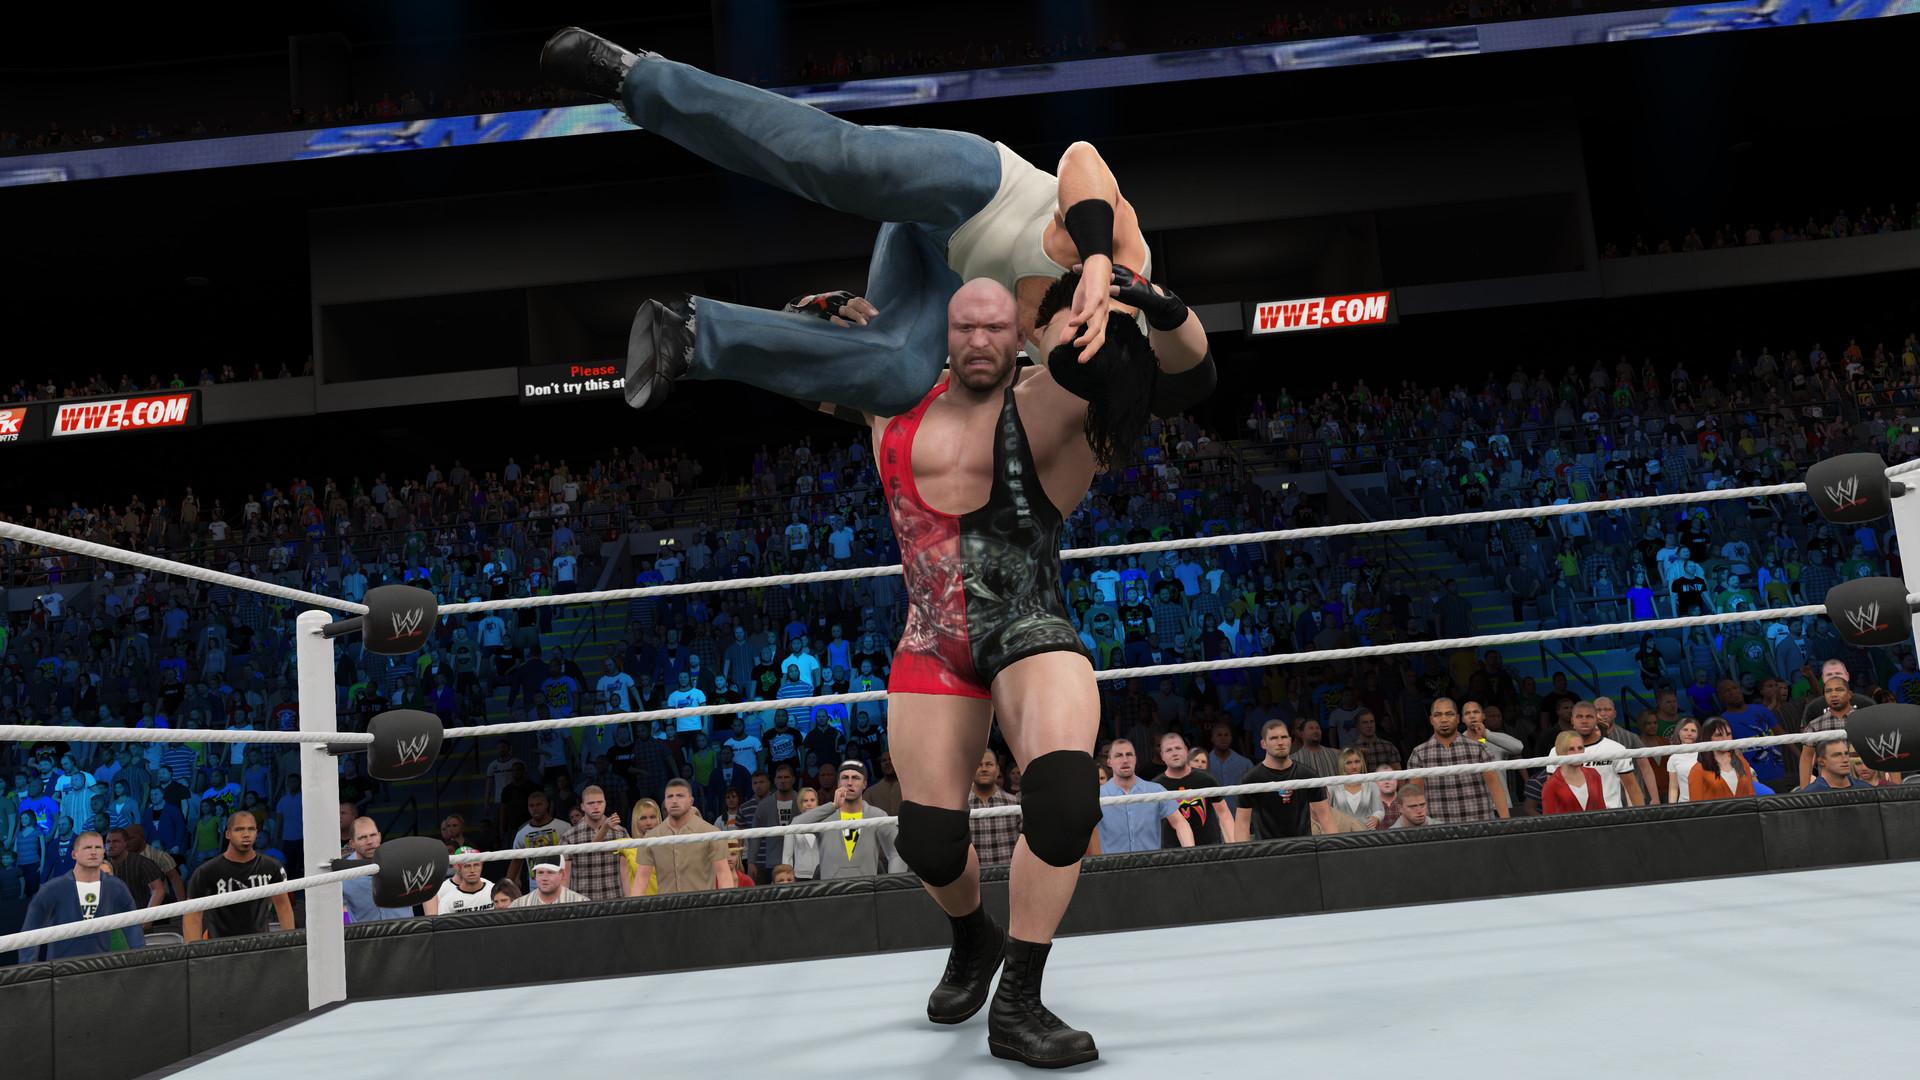 WWE 2K15 ESPAÑOL Full PC + DLC Pack Addon (RELOADED) + REPACK 5 DVD5 (JPW) 7